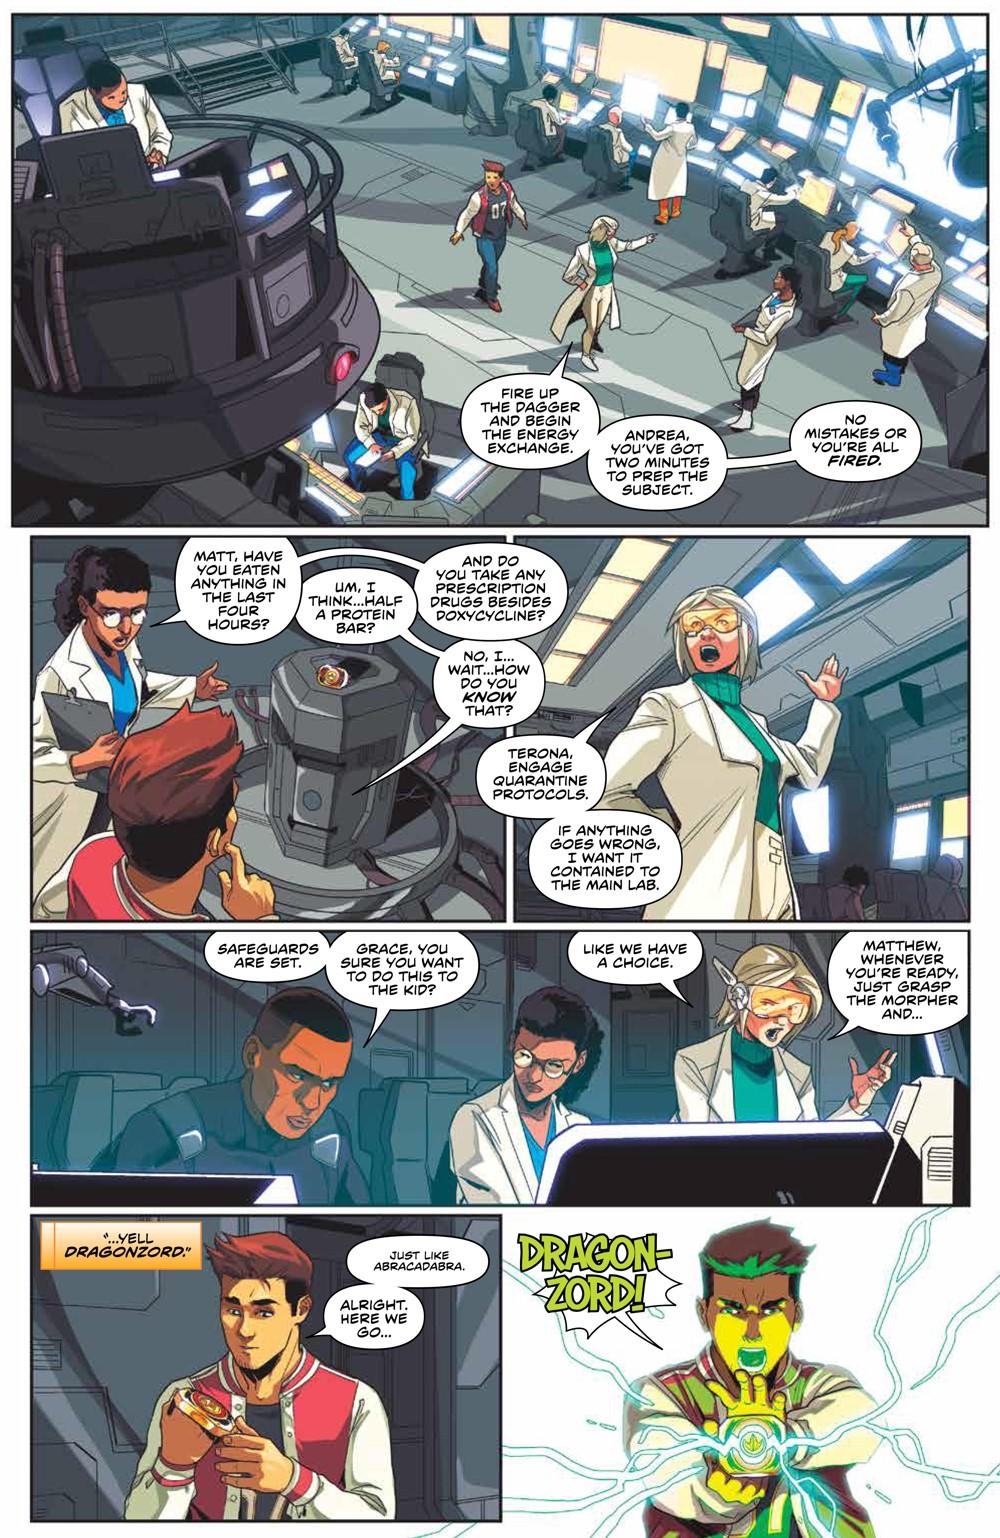 MightyMorphin_v2_SC_PRESS_9 ComicList Previews: MIGHTY MORPHIN VOLUME 2 TP